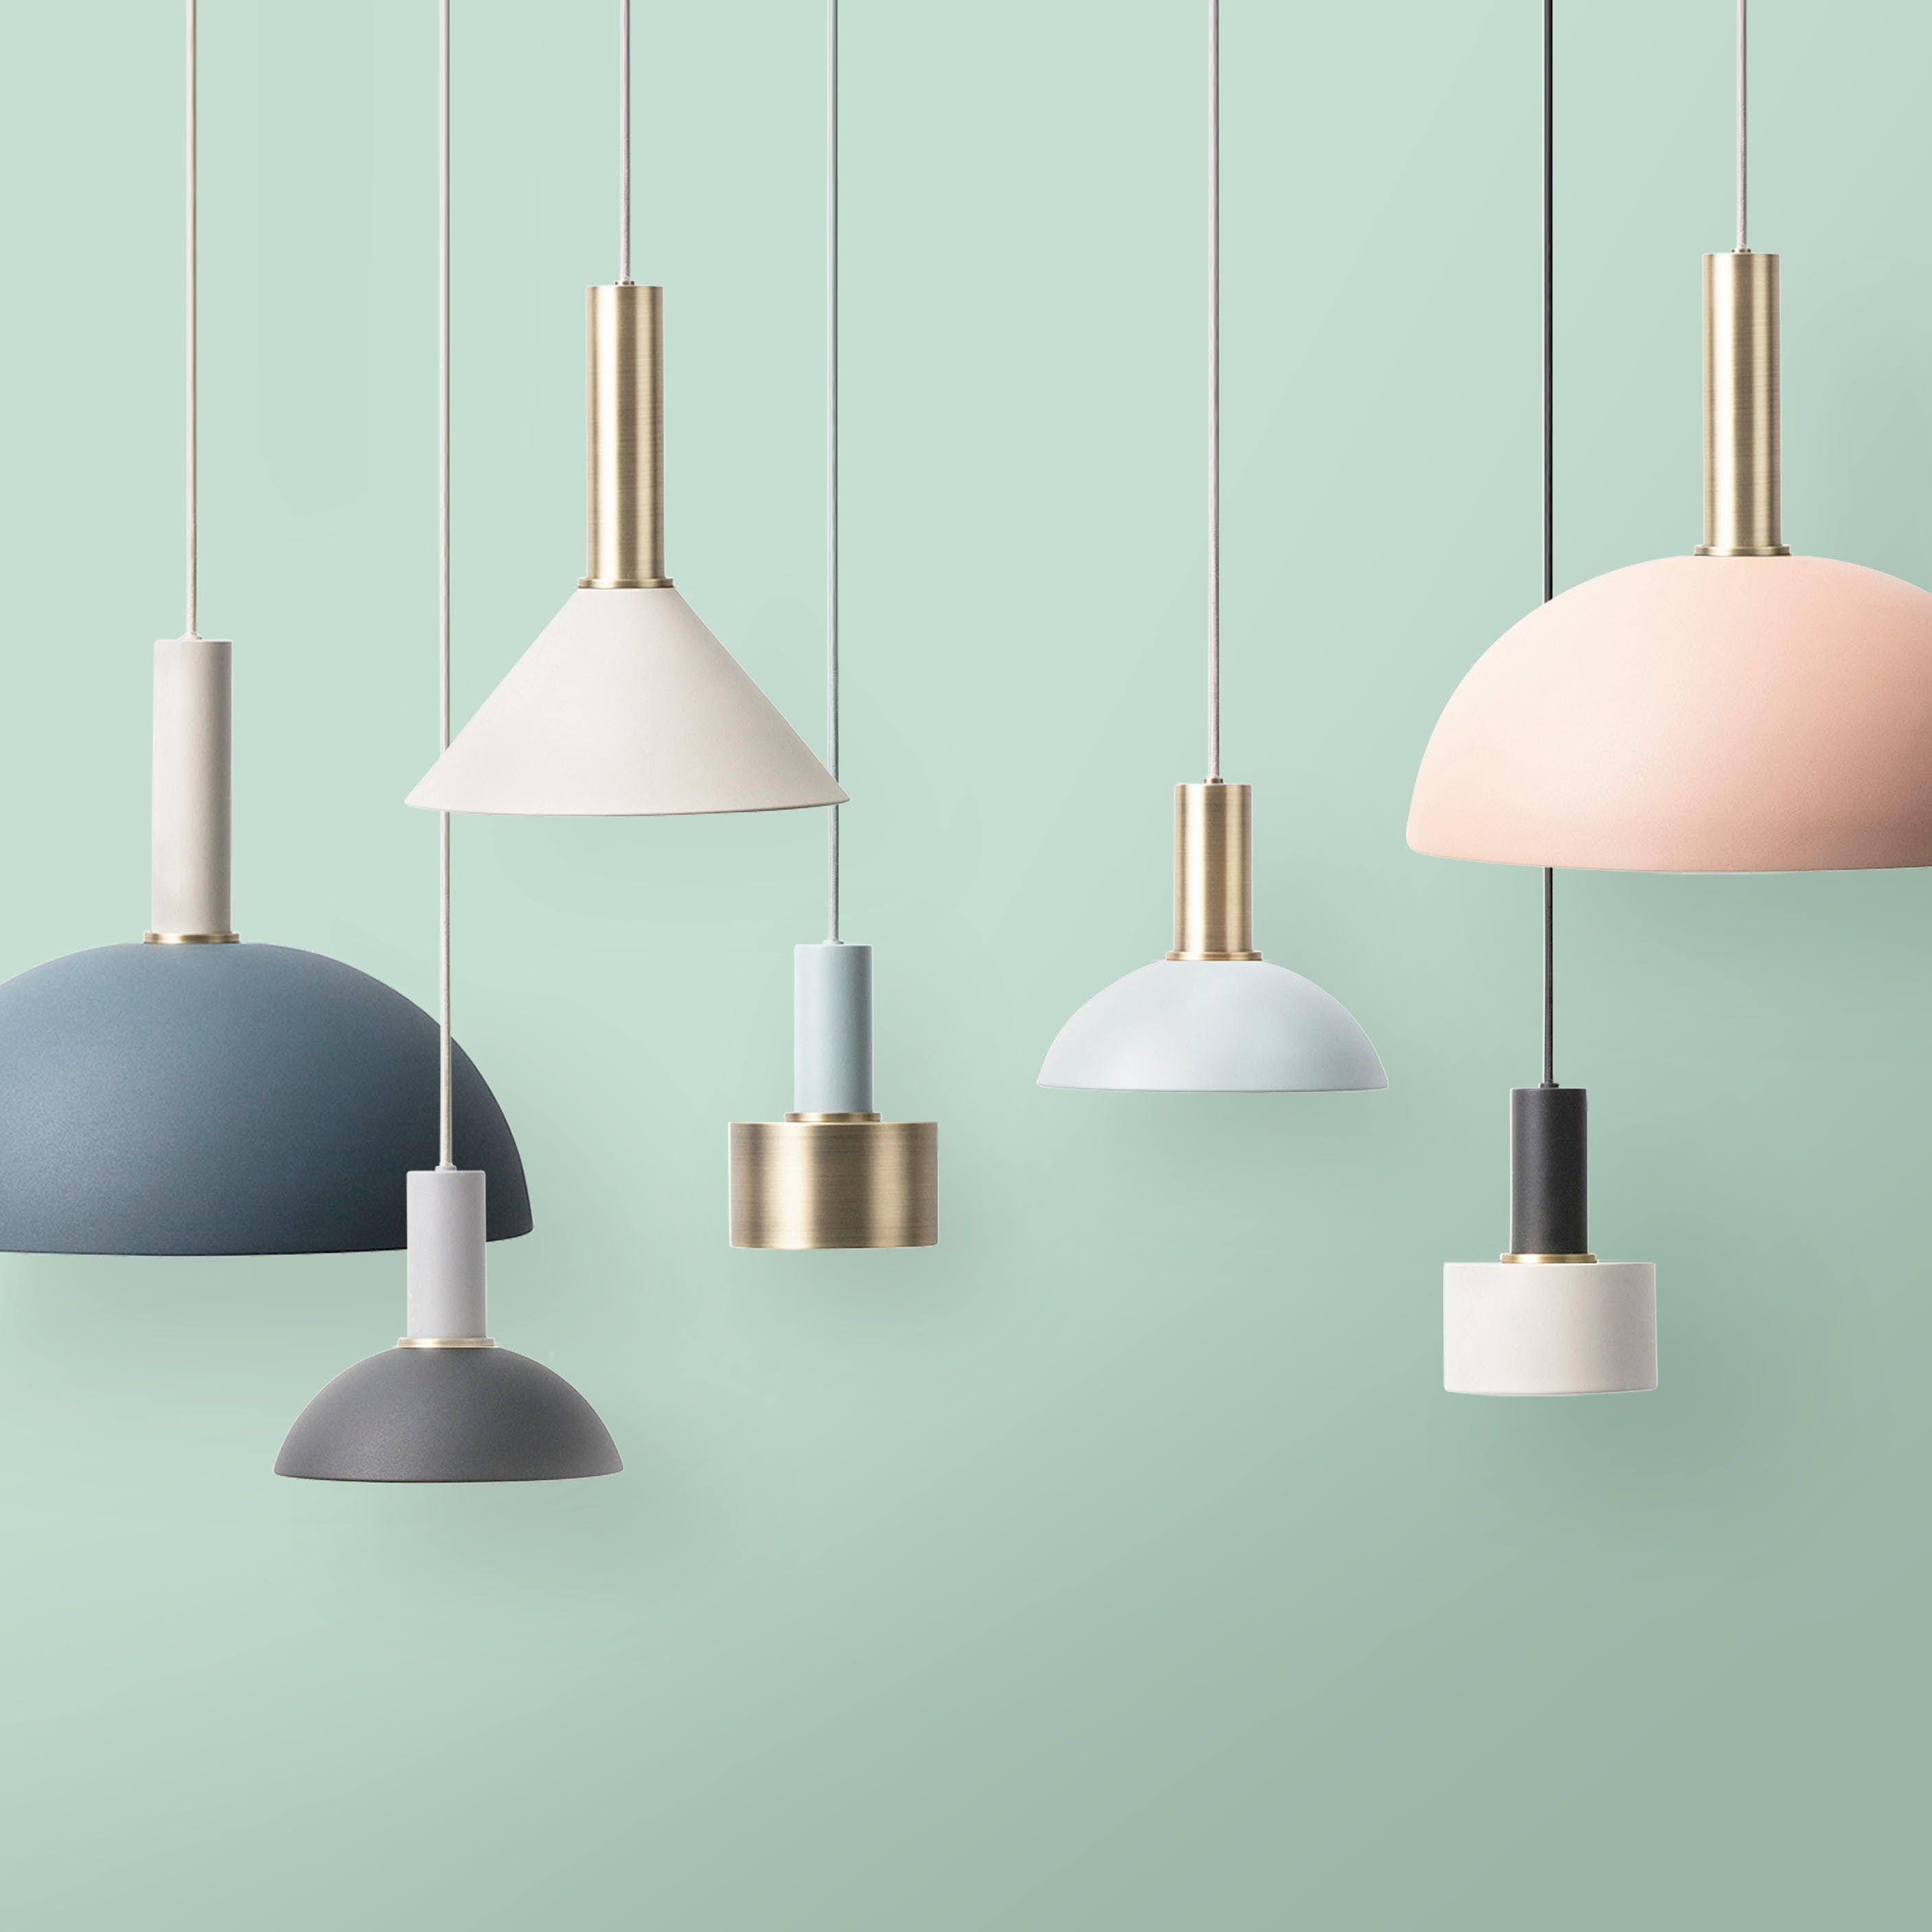 4 Eye Opening Cool Tips Plastic Lamp Shades Diy Painting Lamp